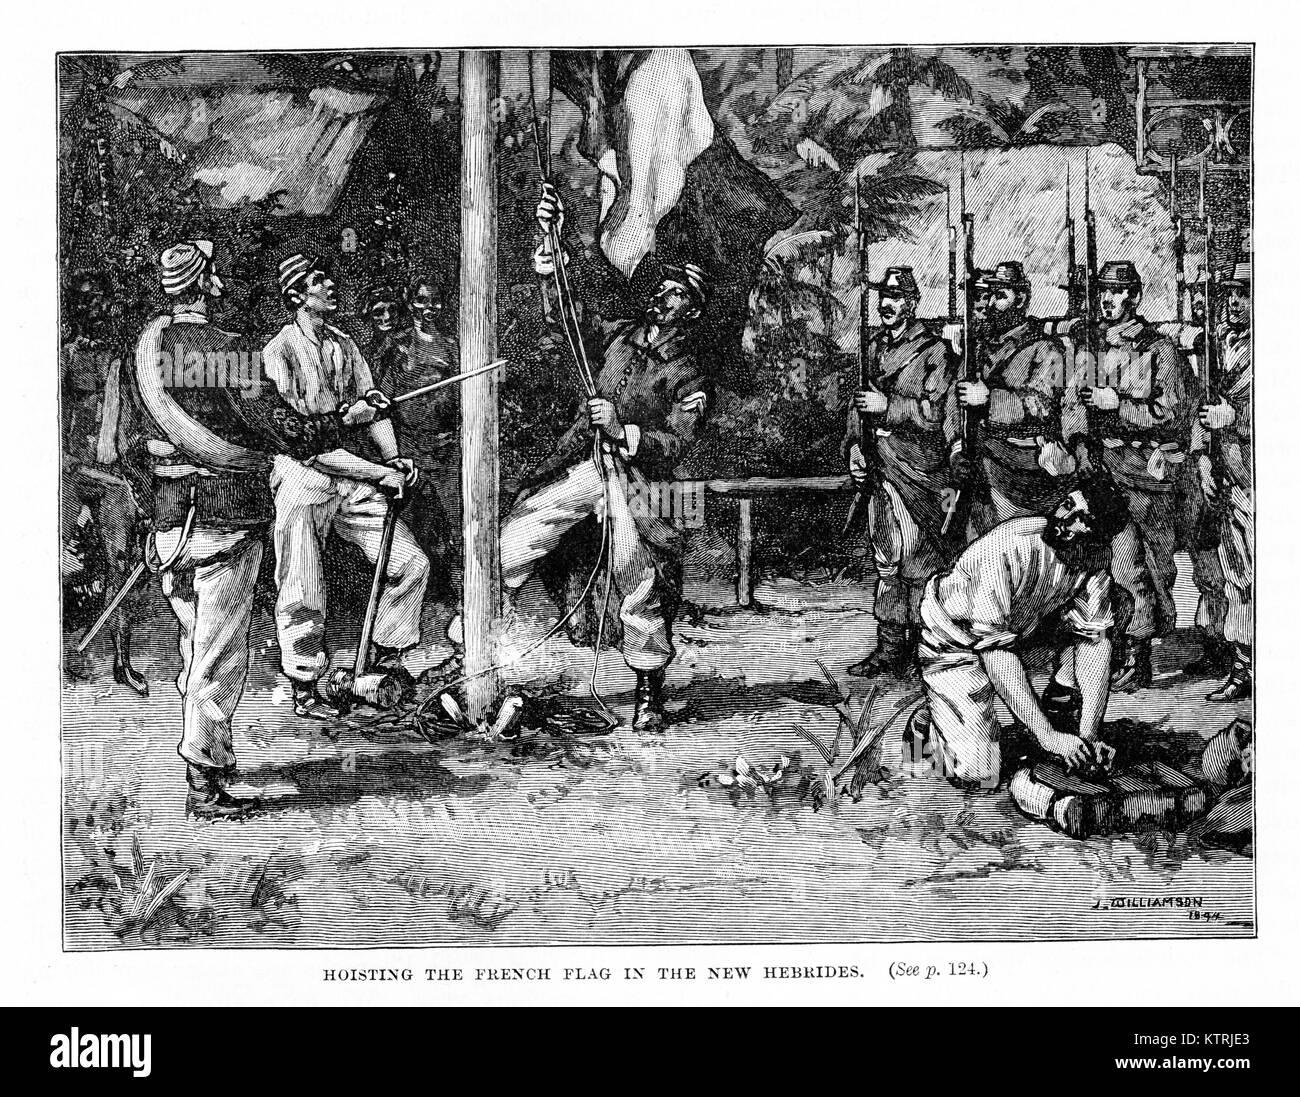 Hoisting the French flag in the New Hebrides, 1886. Black and White Illustration - Stock Image